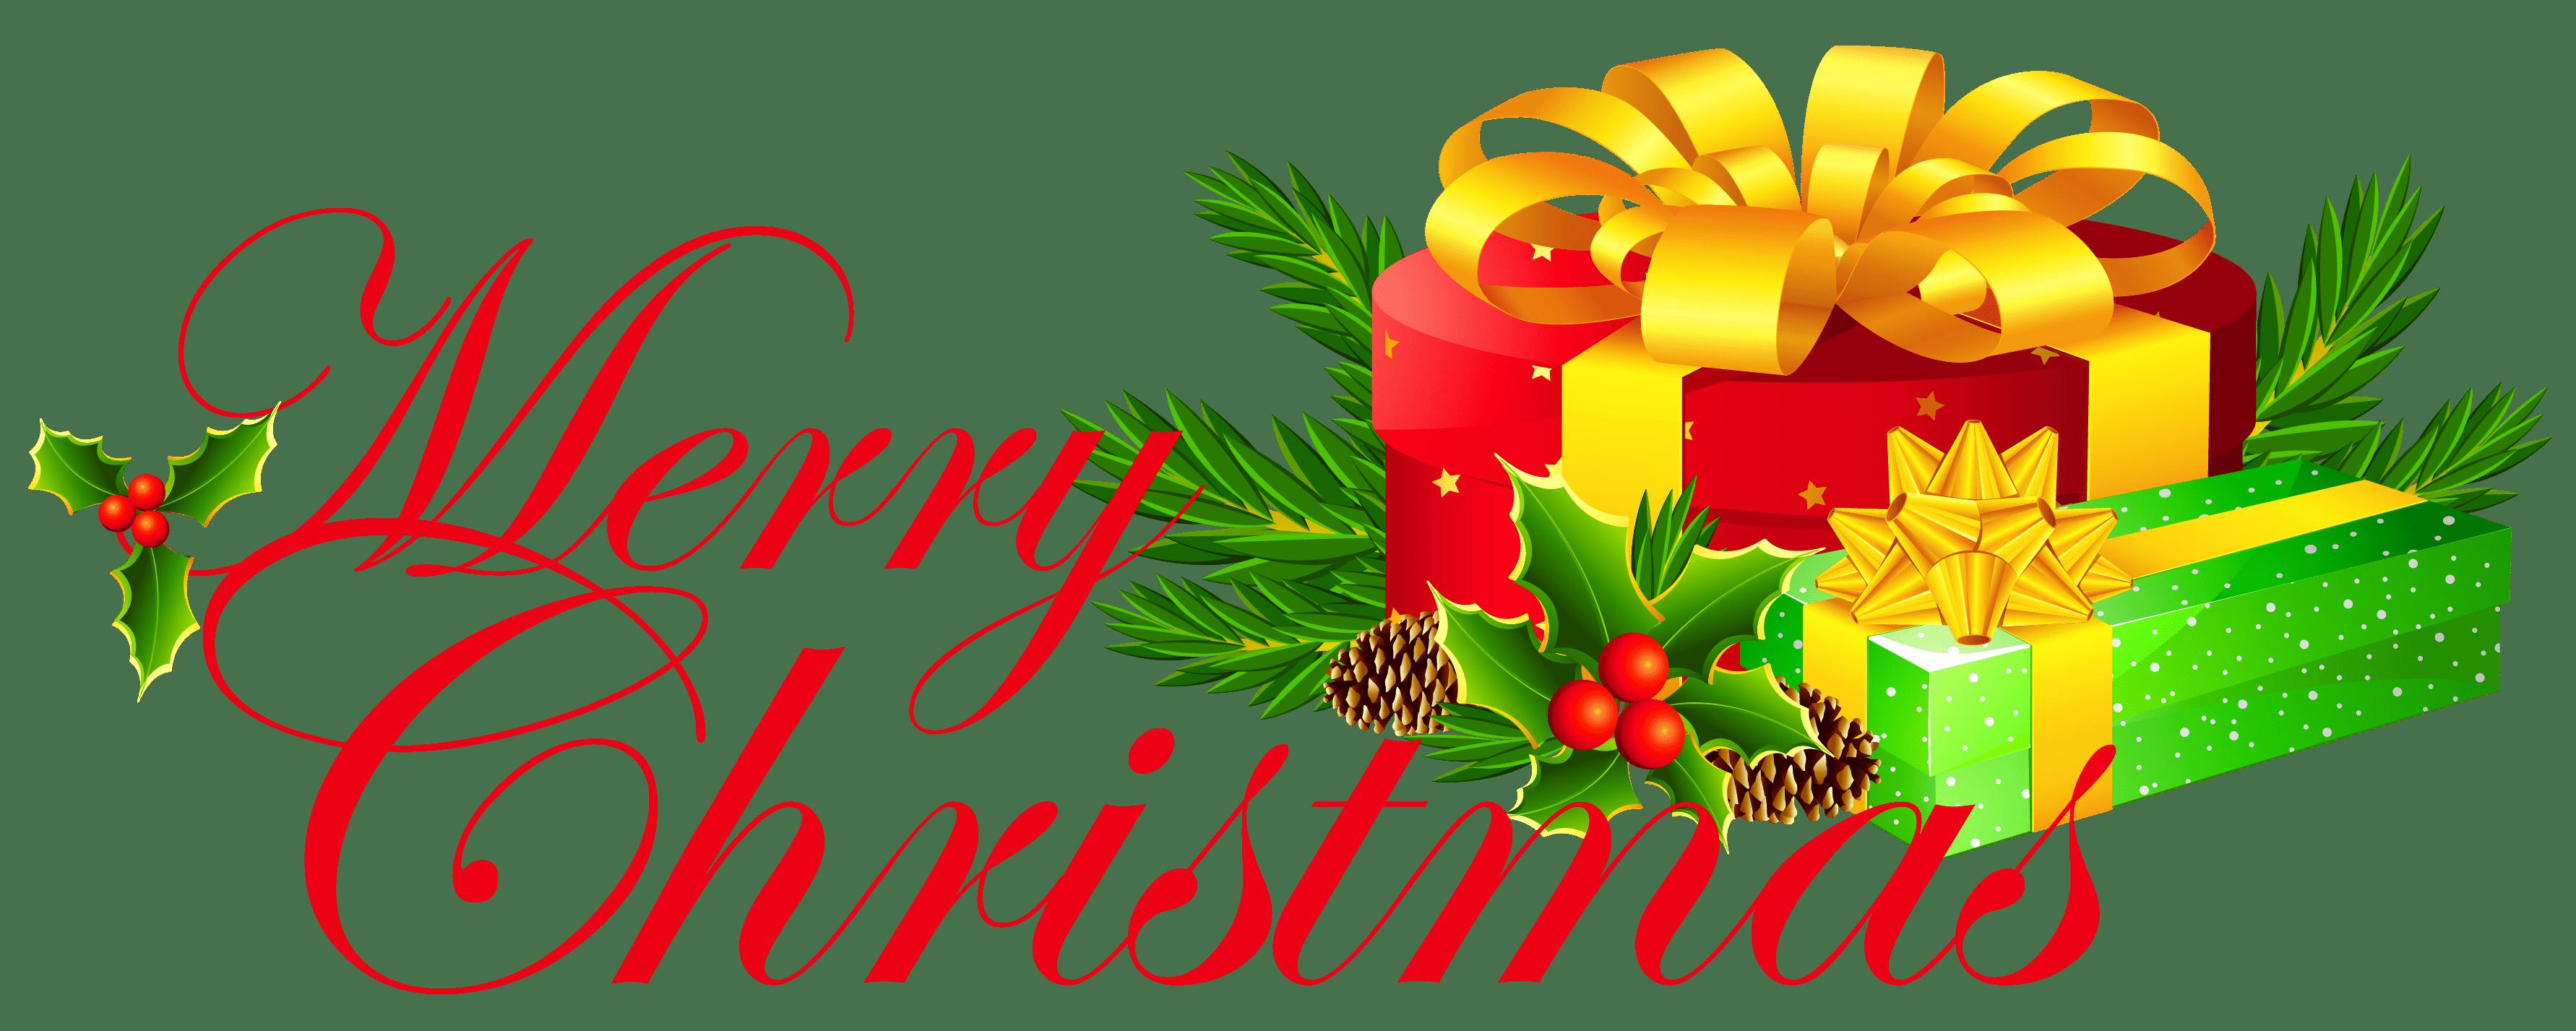 Nativity clipart merry christmas, Nativity merry christmas.